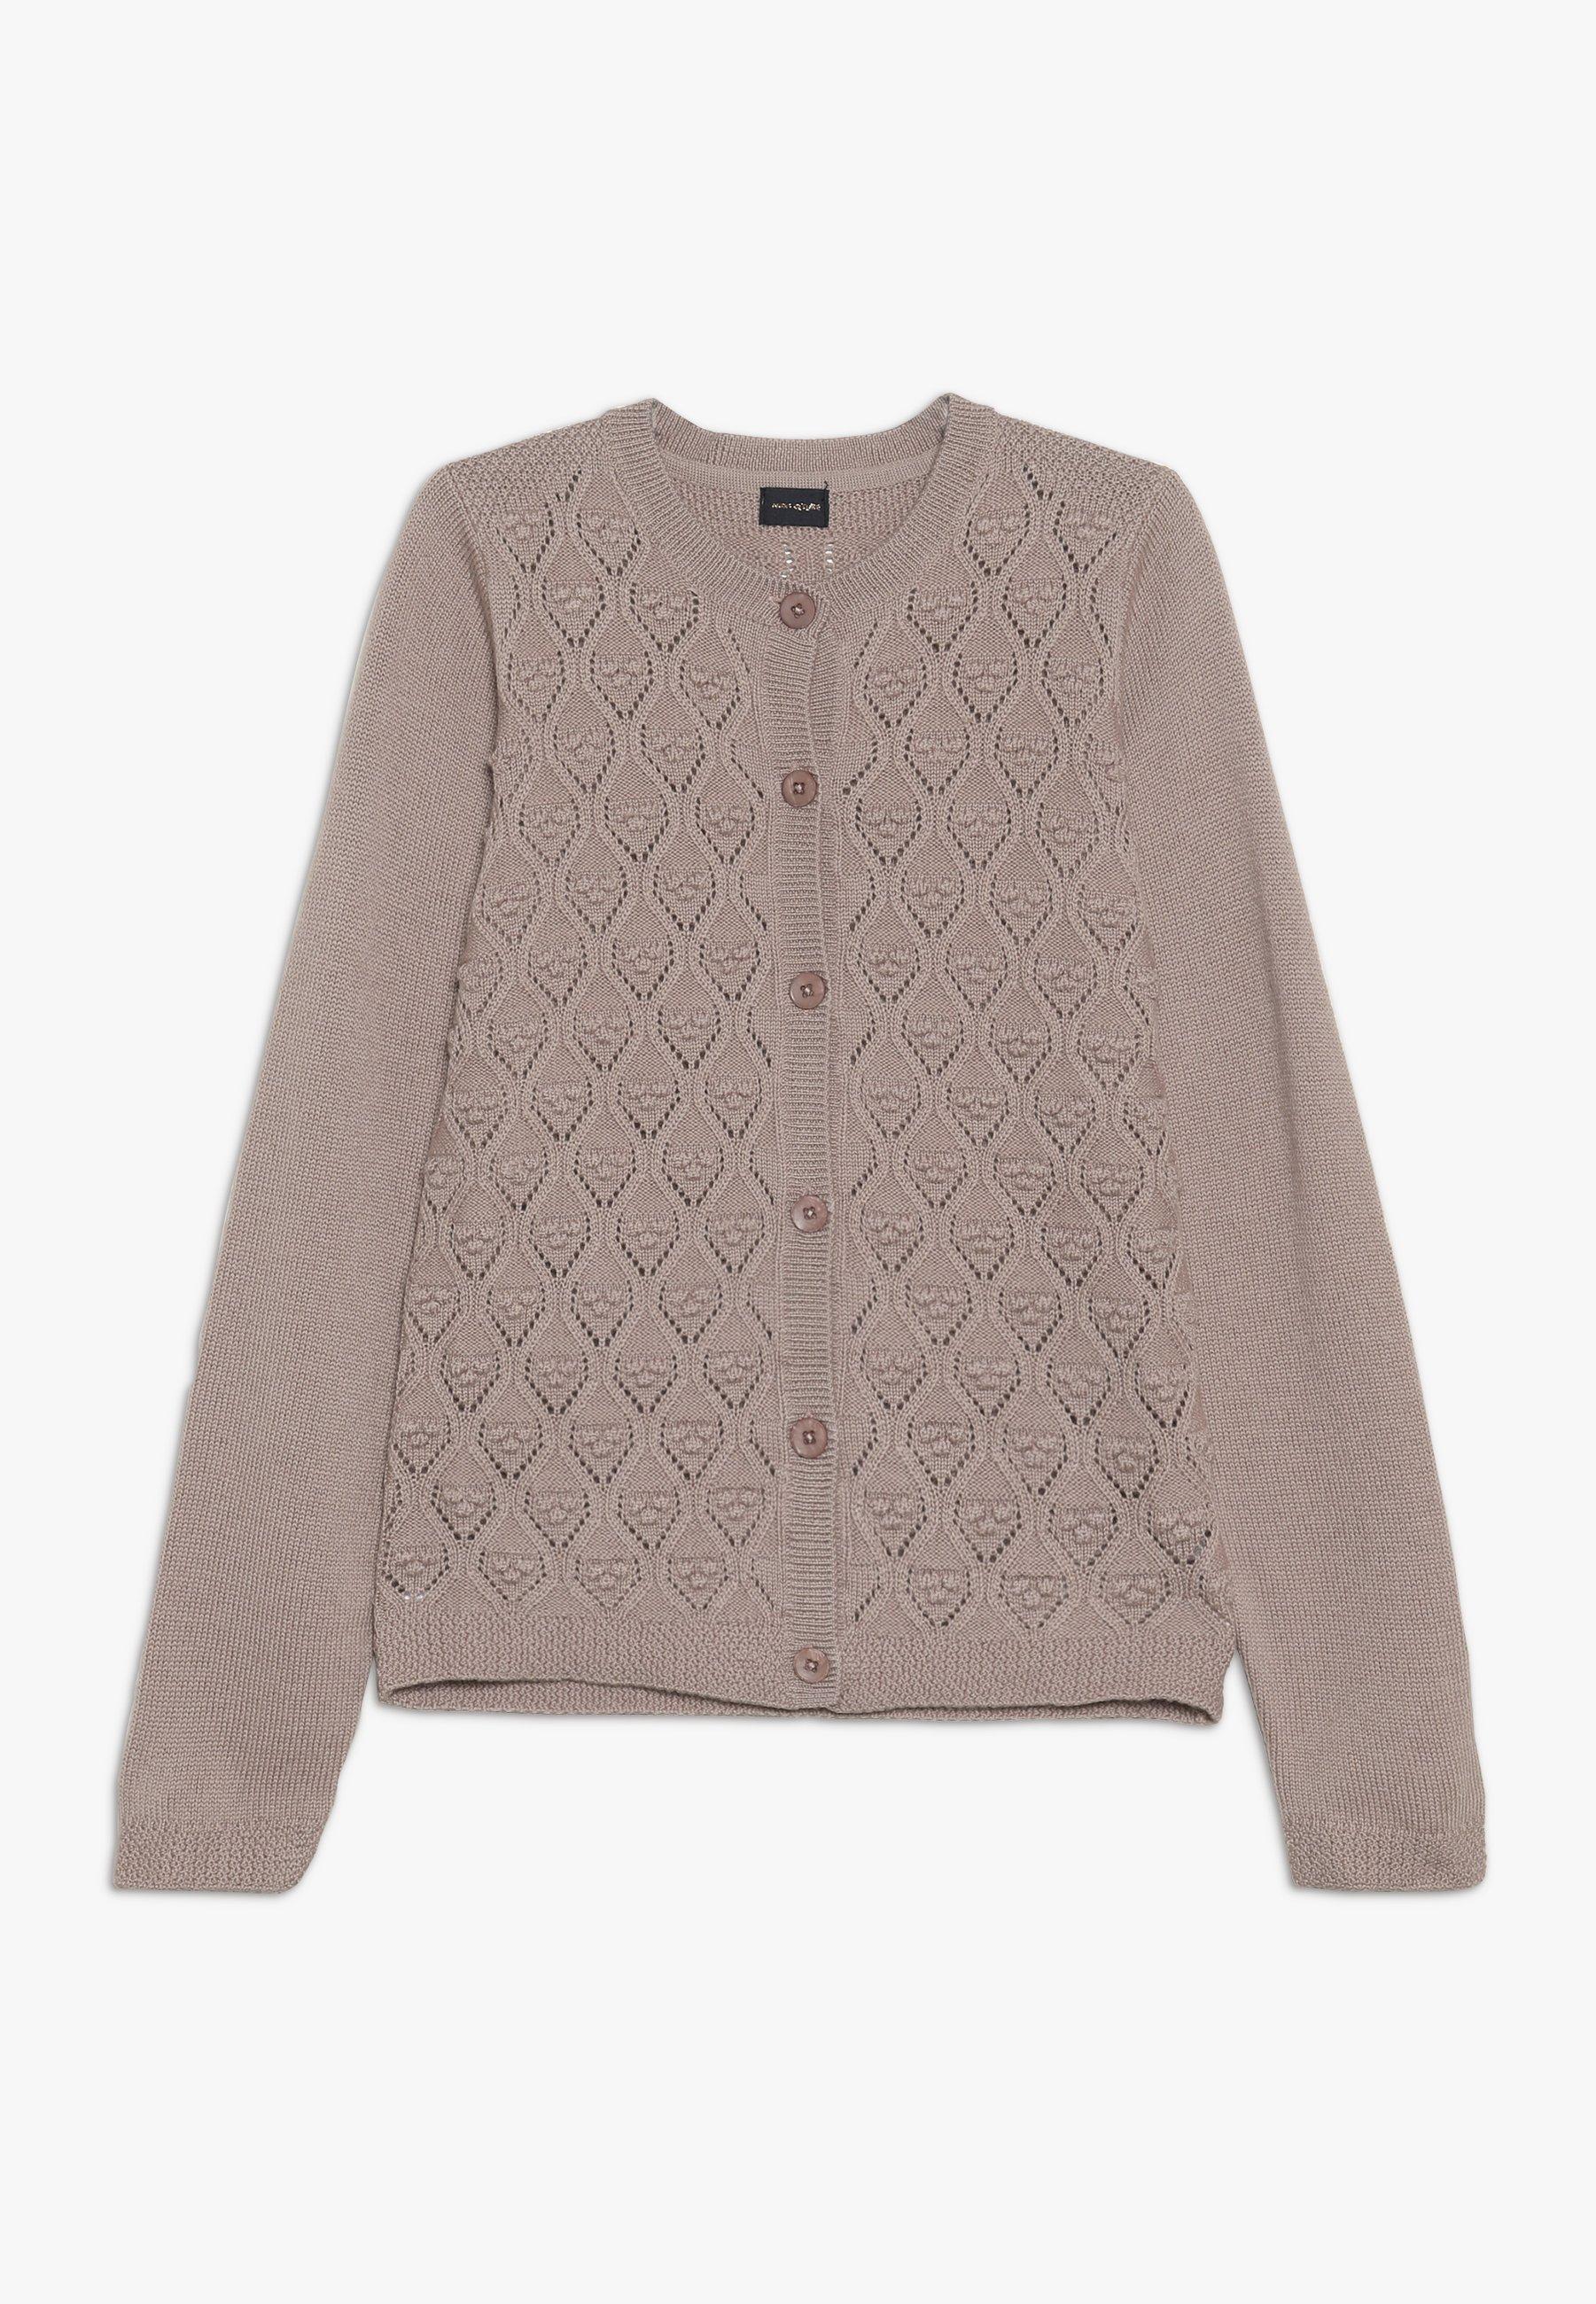 Große Förderung MINI A TURE LAERKE CARDIGAN - Strickjacke - muted lilac | Damenbekleidung 2020